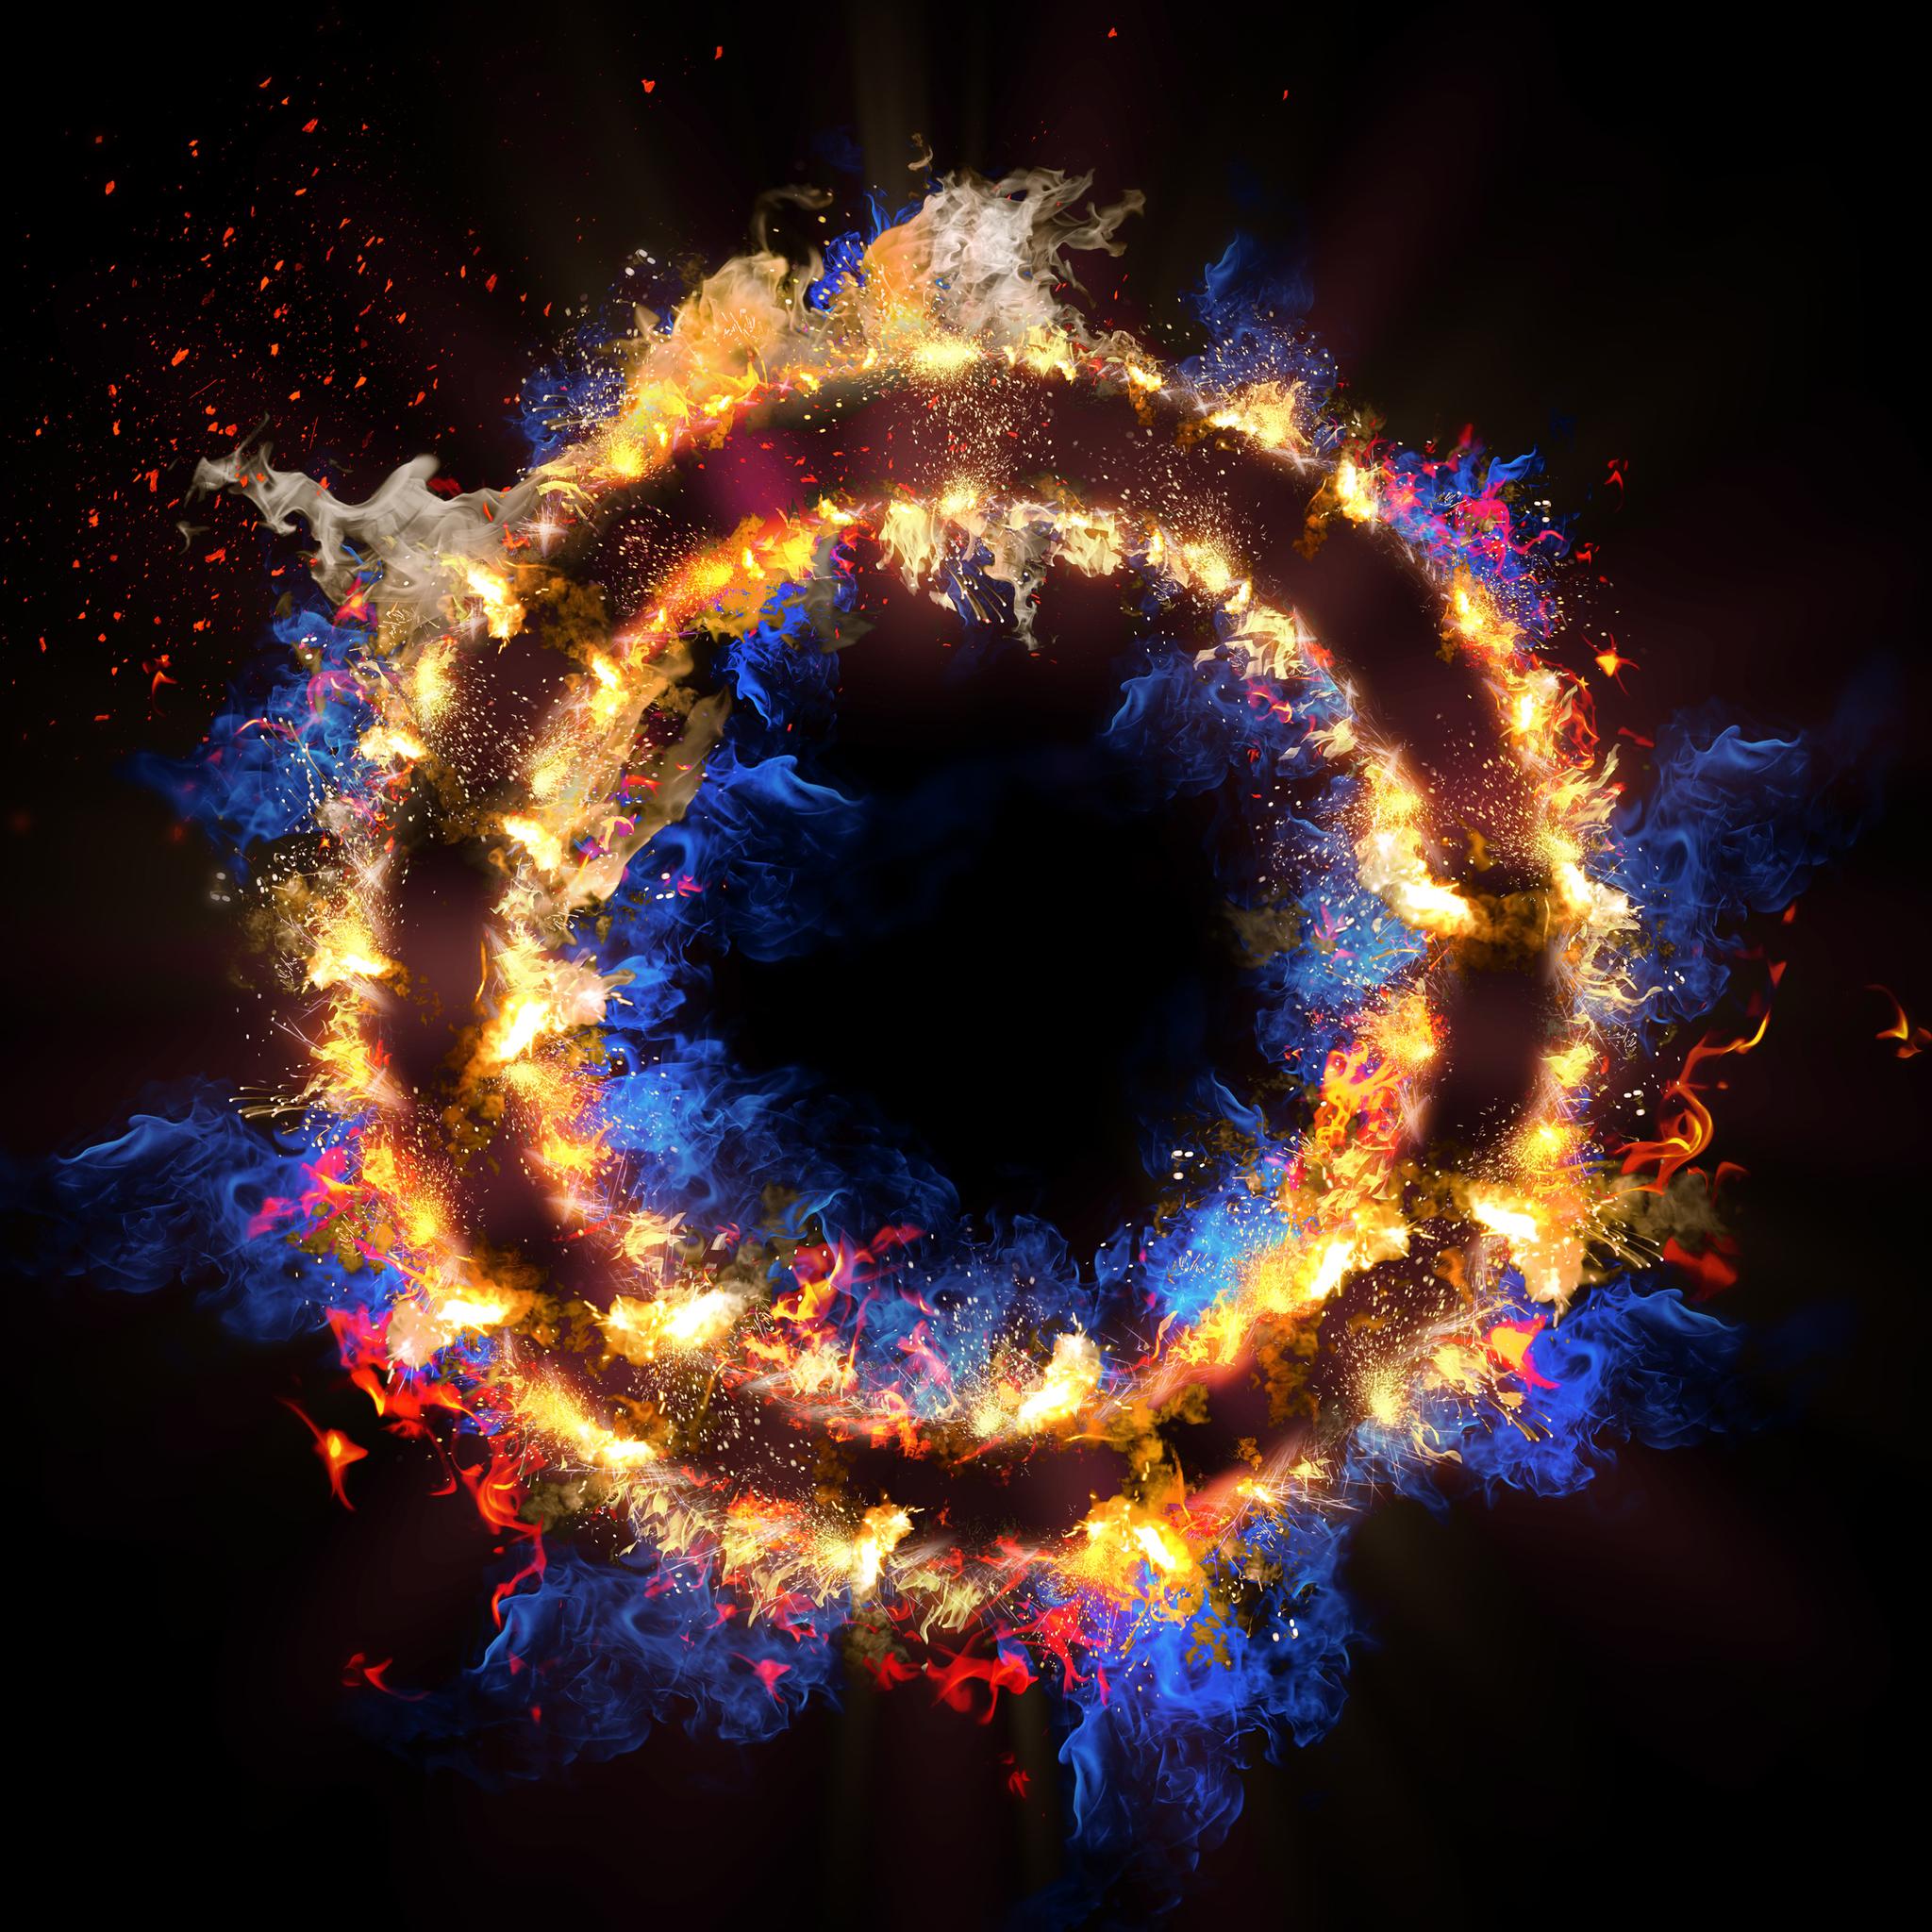 flame-circle-3d-abstract-5k-eg.jpg